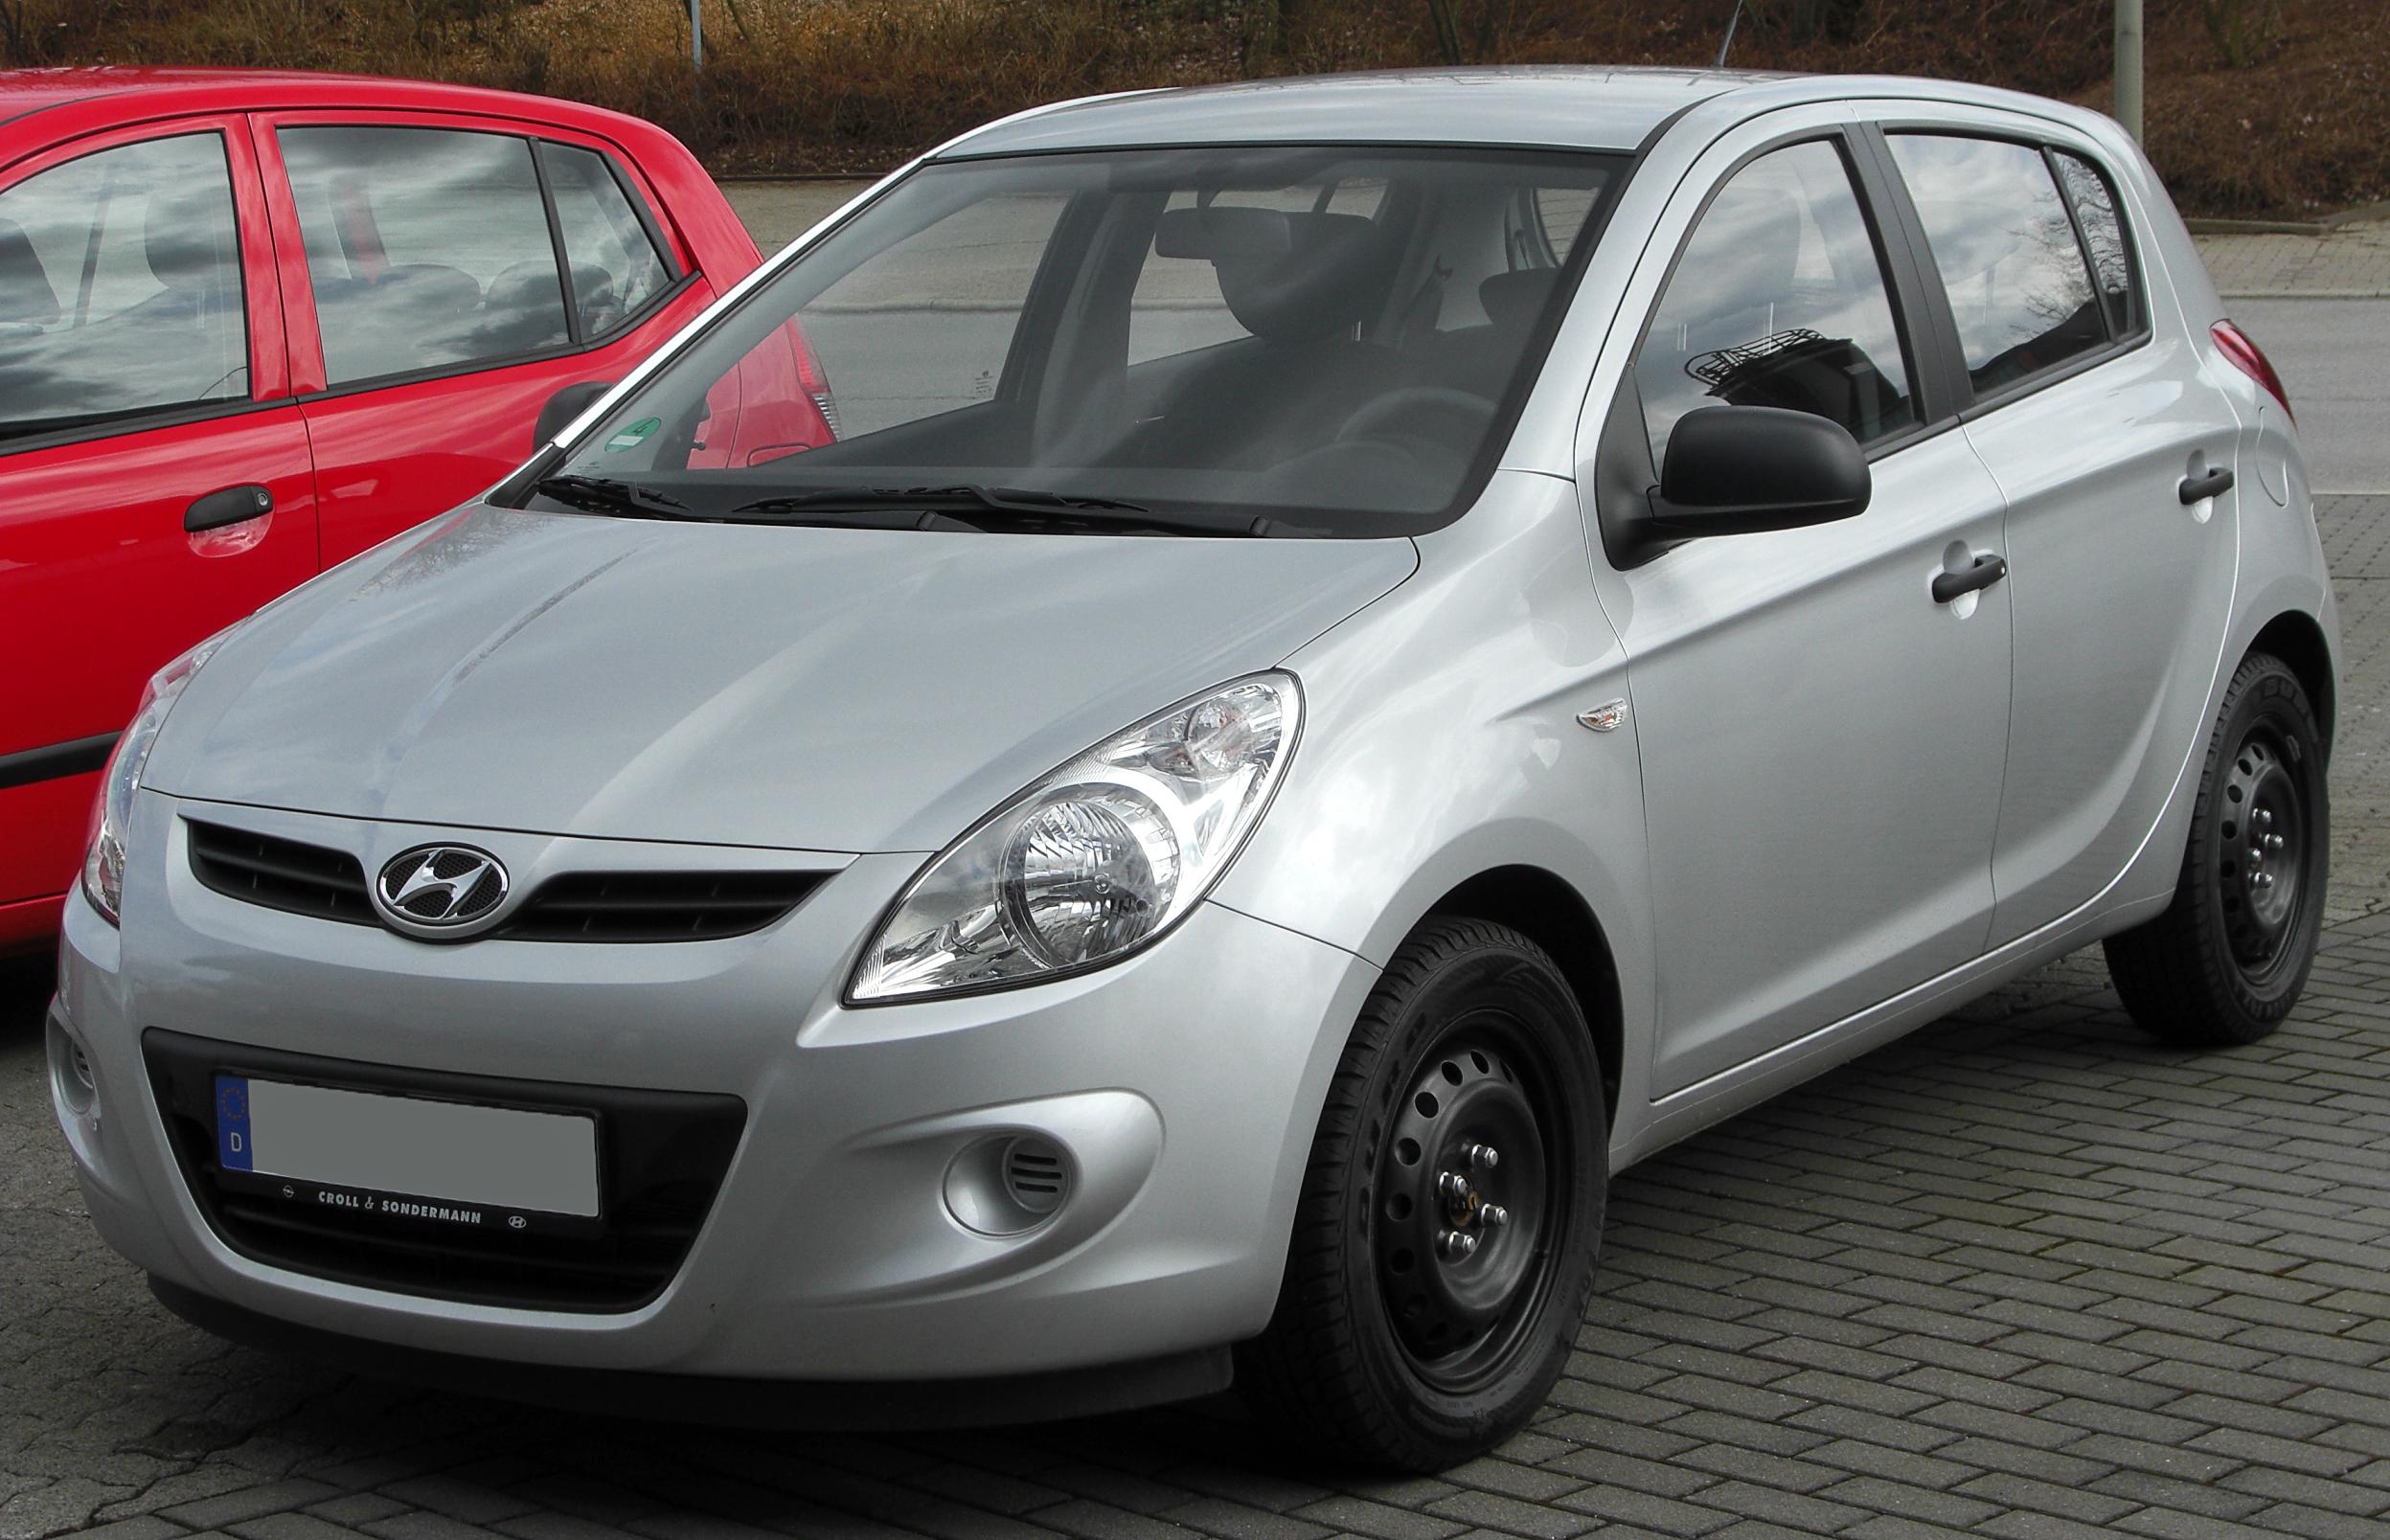 File:Hyundai i20 front 20100328.jpg - Wikimedia Commons